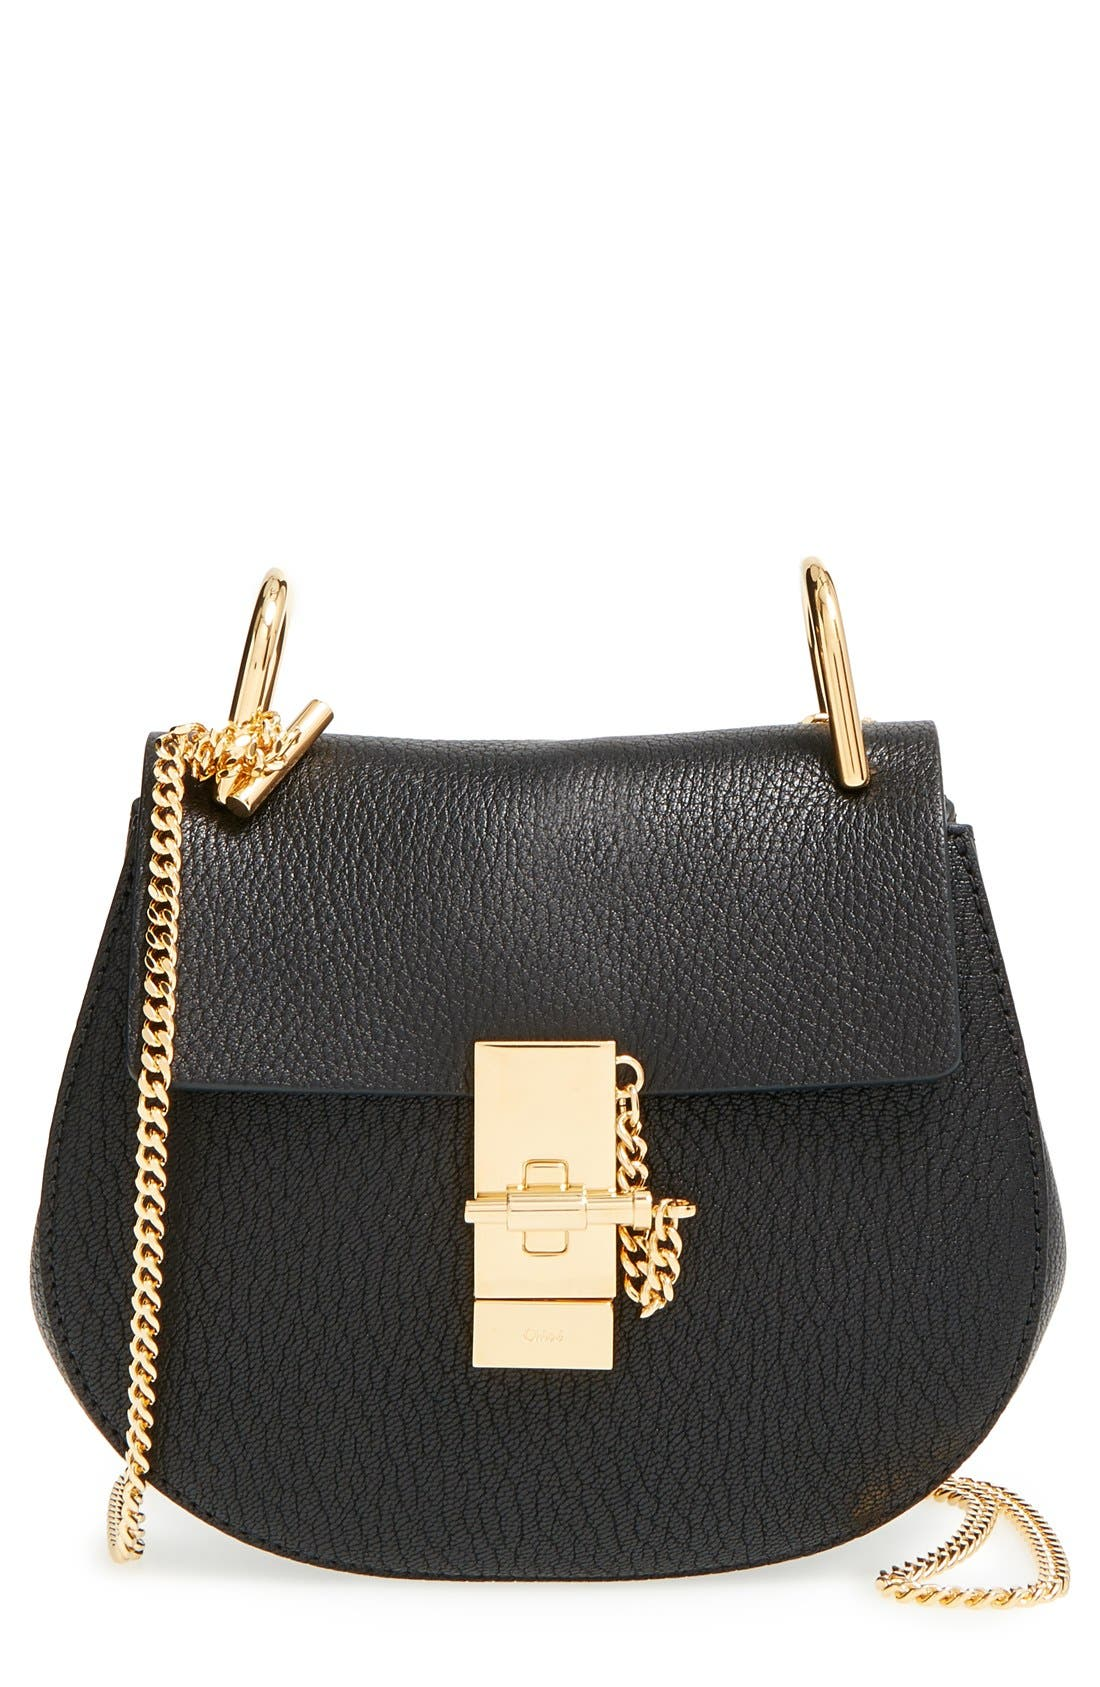 Alternate Image 1 Selected - Chloé 'Mini Drew' Leather Shoulder Bag